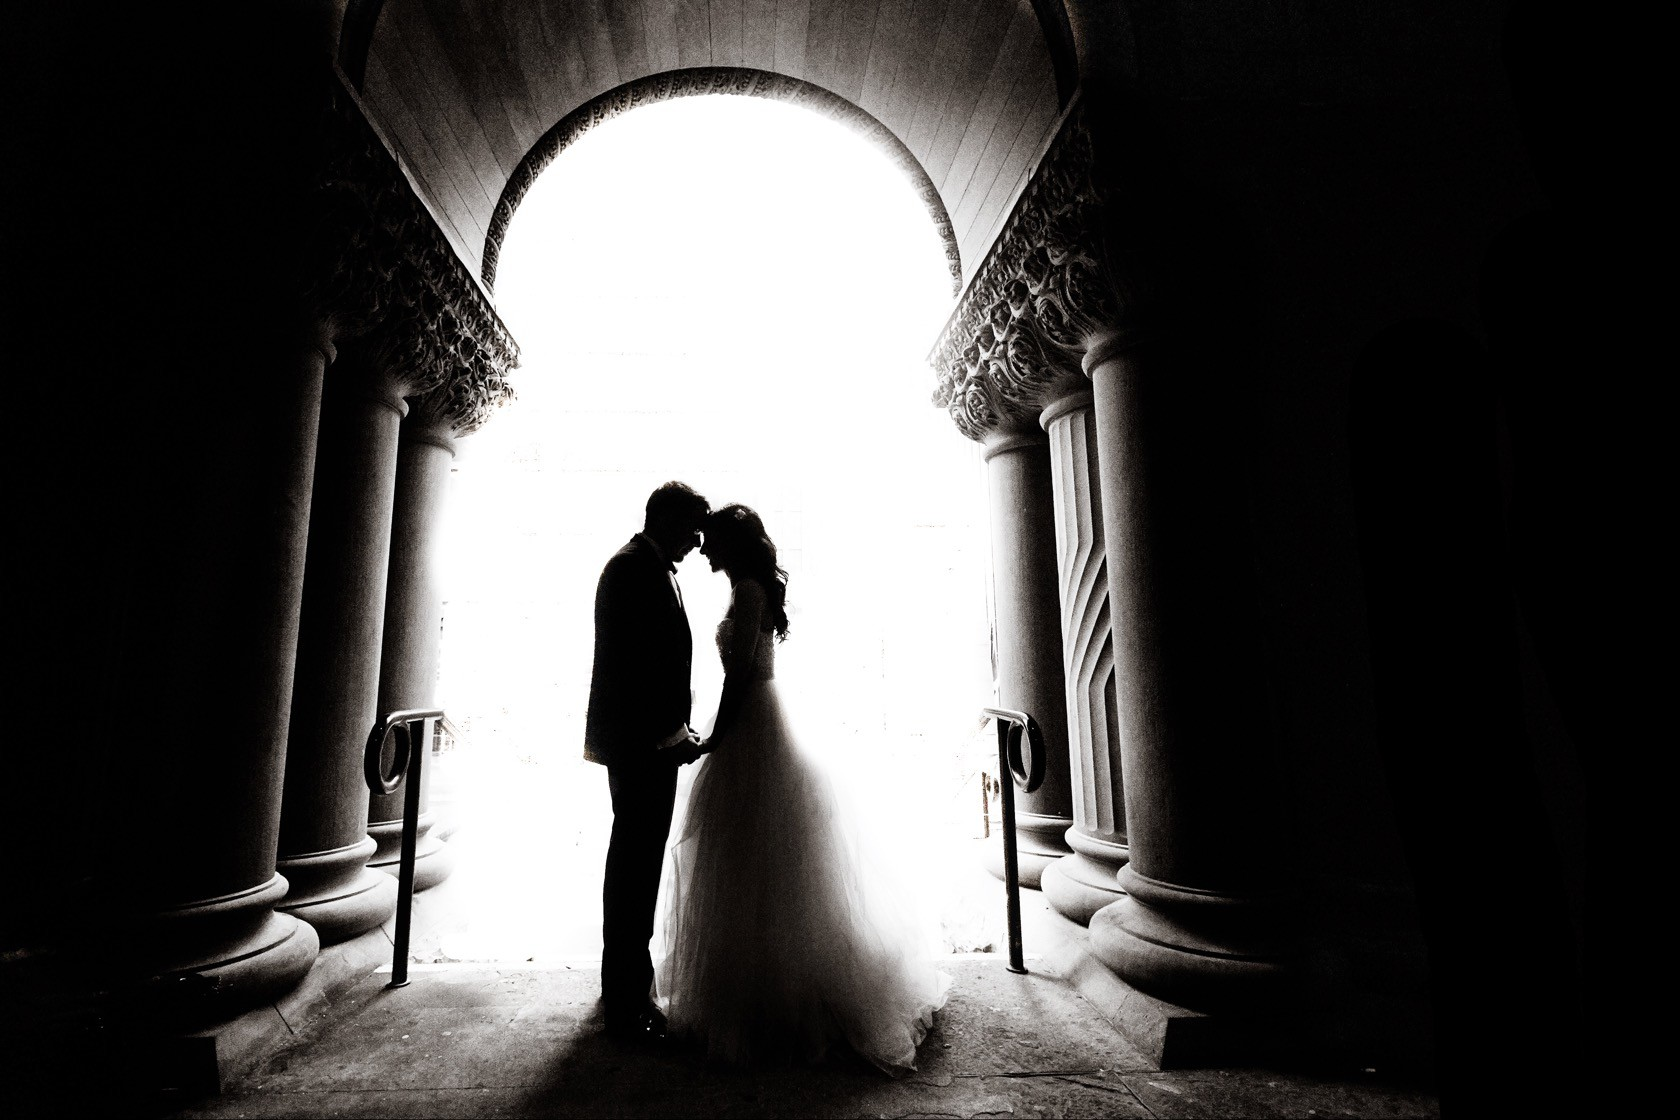 stephen sager photography 0125 fine art wedding photography